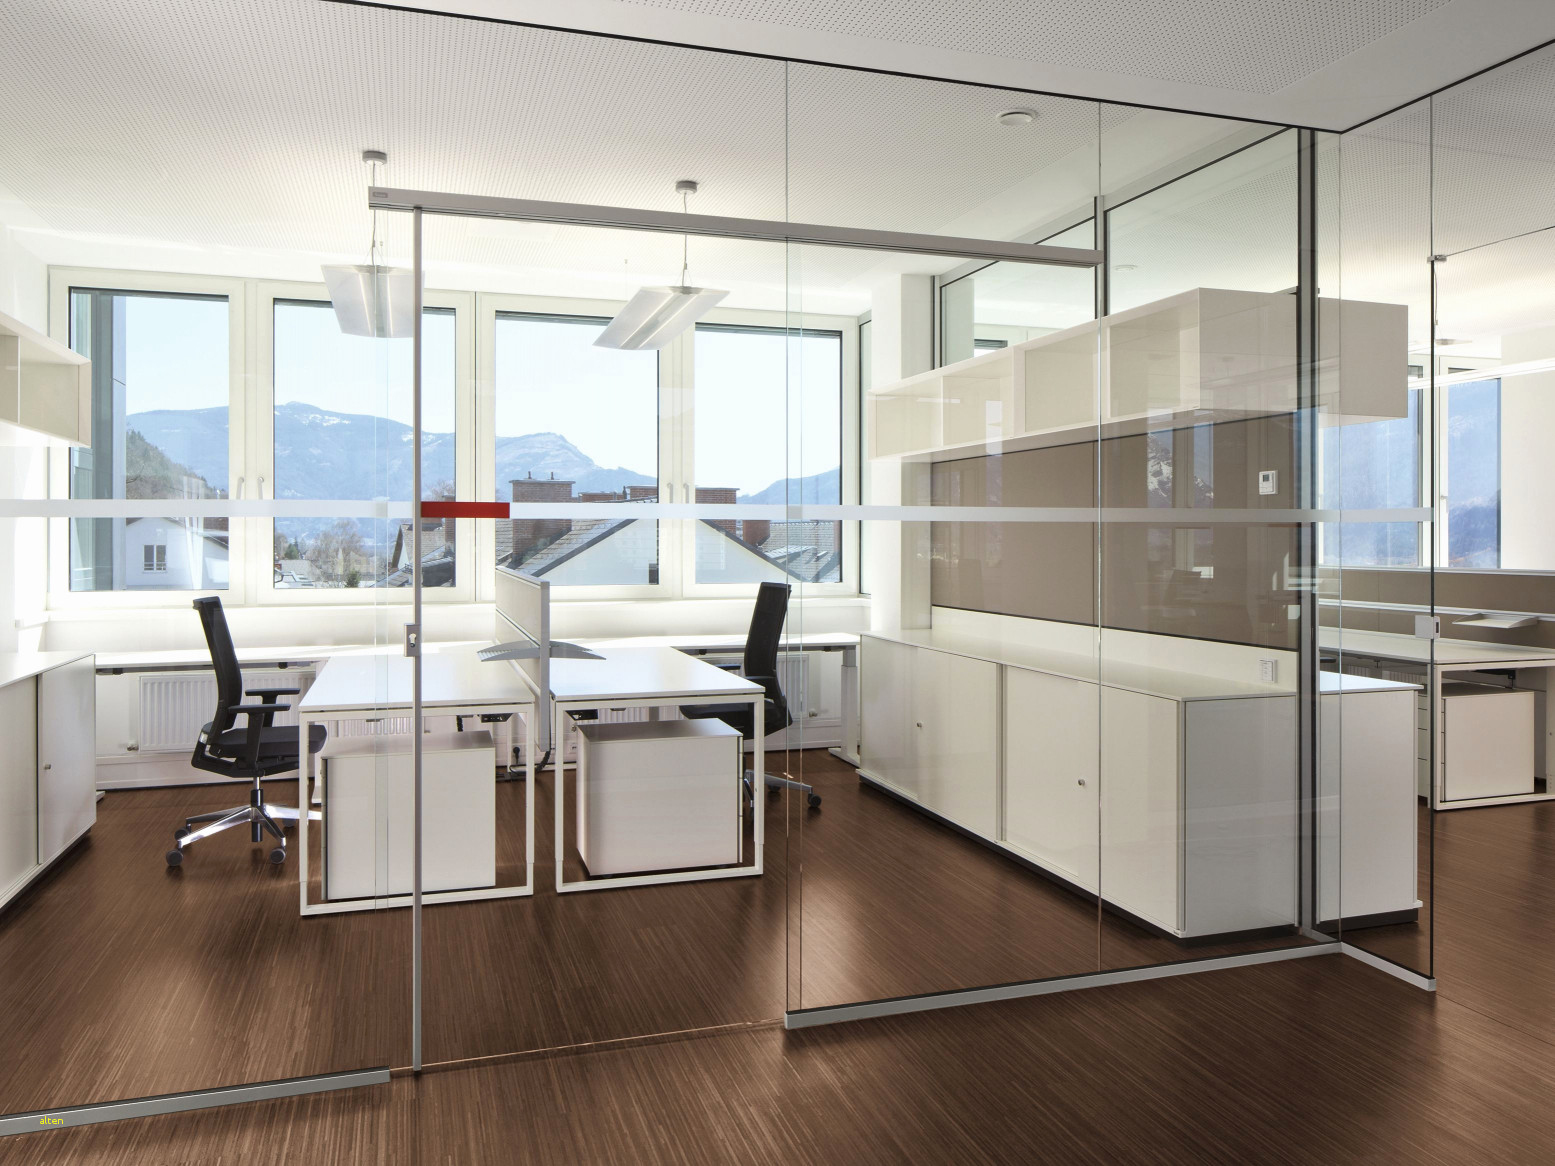 Meuble Salle A Manger Ikea Luxe Collection 23 top Ikea Bureau Blanc Architecture